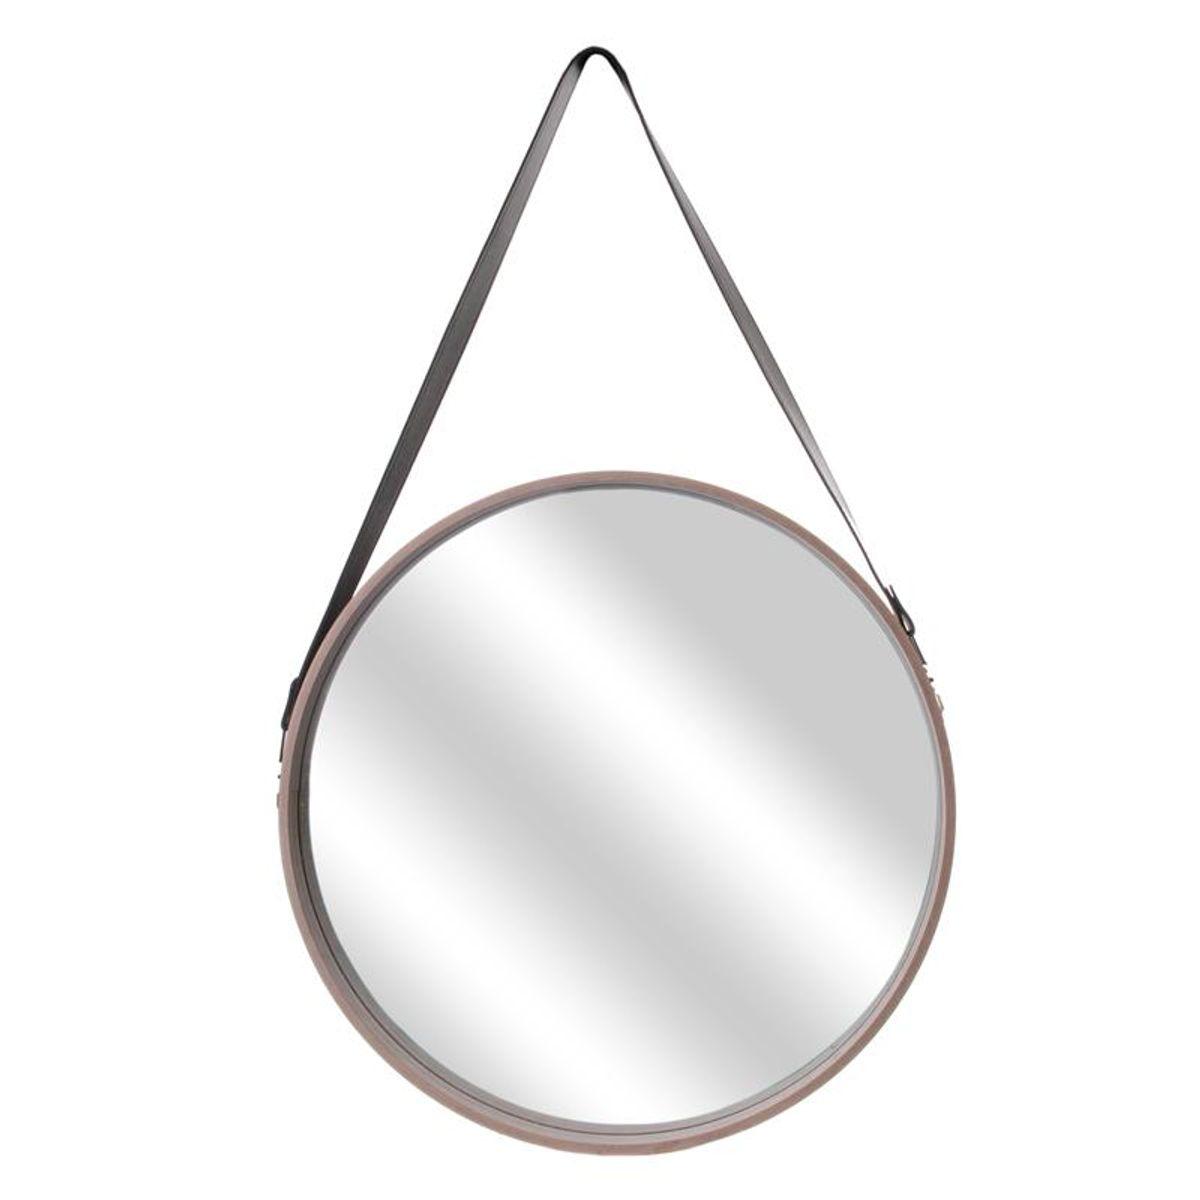 Miroir bois à anse